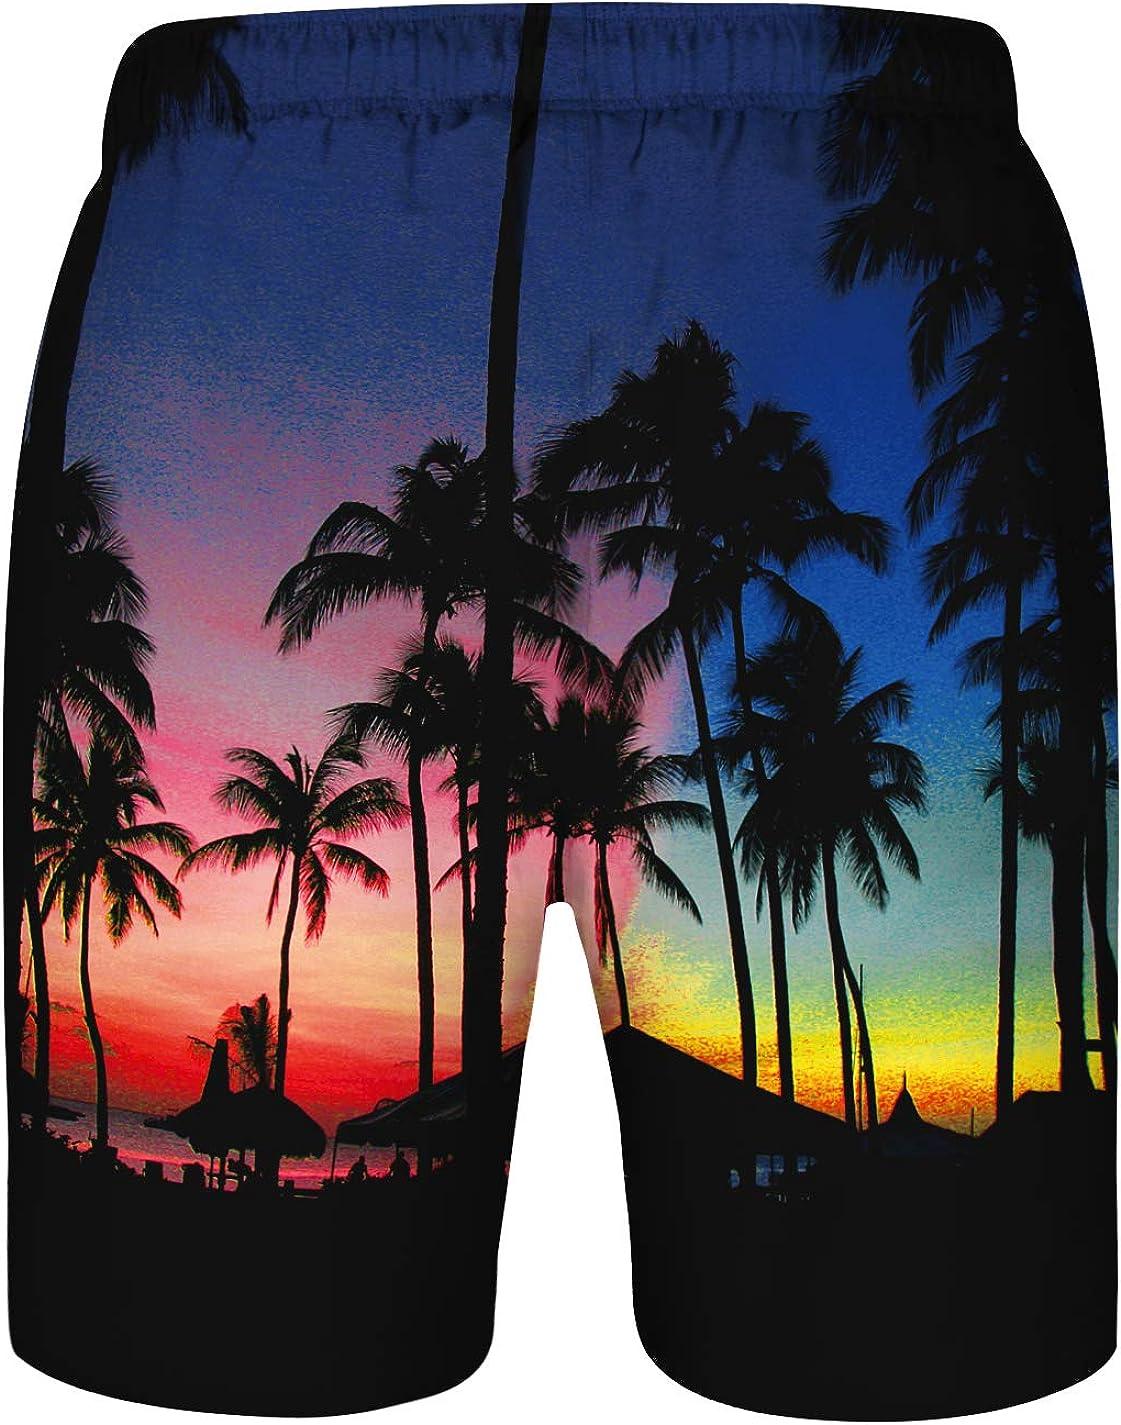 ENLACHIC Mens Swim Trunks Quick Dry 3D Print Beach Boardshorts with Mesh Lining